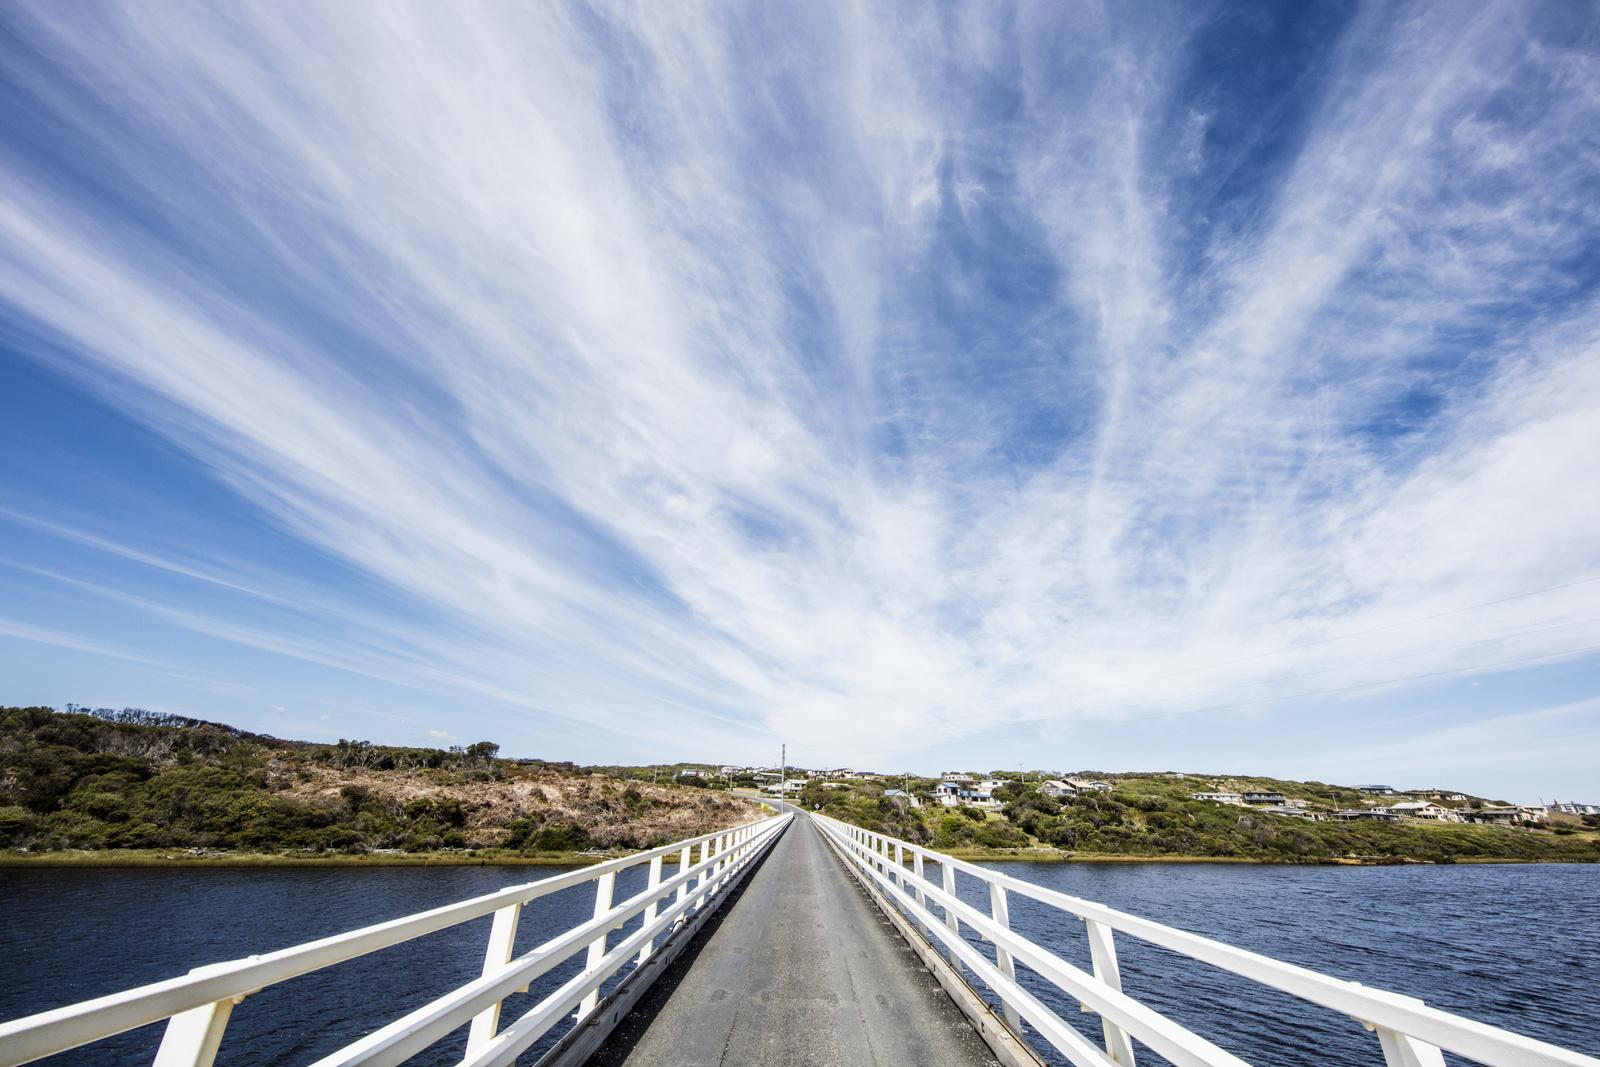 Crossing the Arthur River Bridge